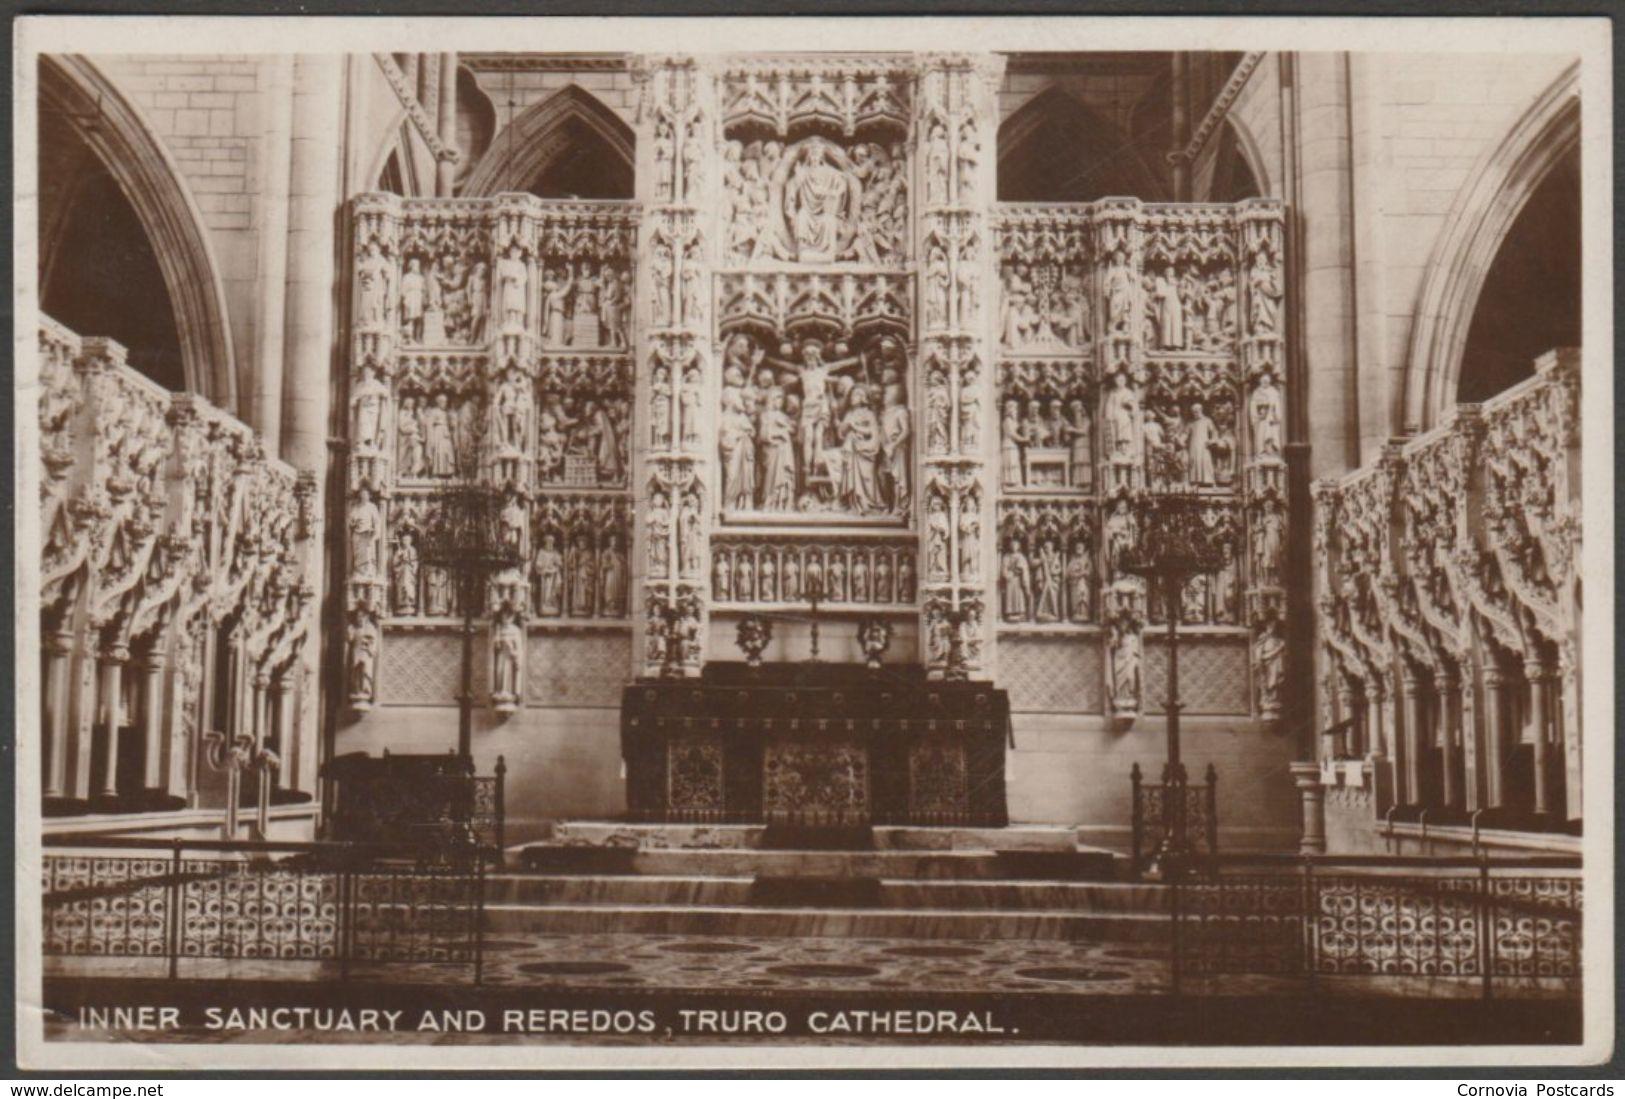 Inner Sanctuary & Reredos, Truro Cathedral, Cornwall, 1930 - Milton RP Postcard - England